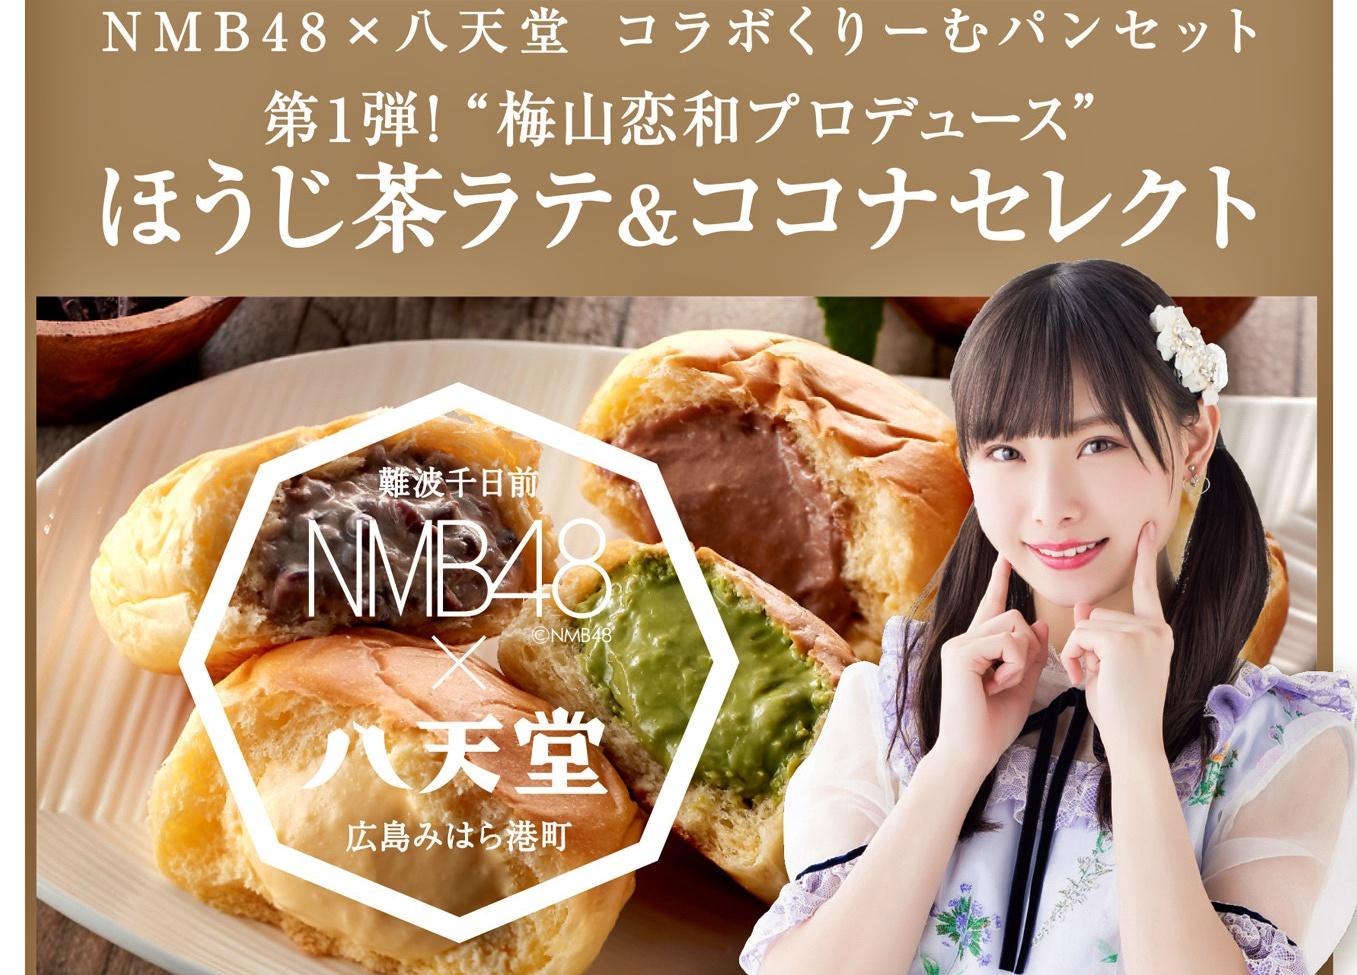 【NMB48】5/11「床の間正座娘」全国握手会で「NMB48×八天堂 コラボくりーむパンセット」が販売